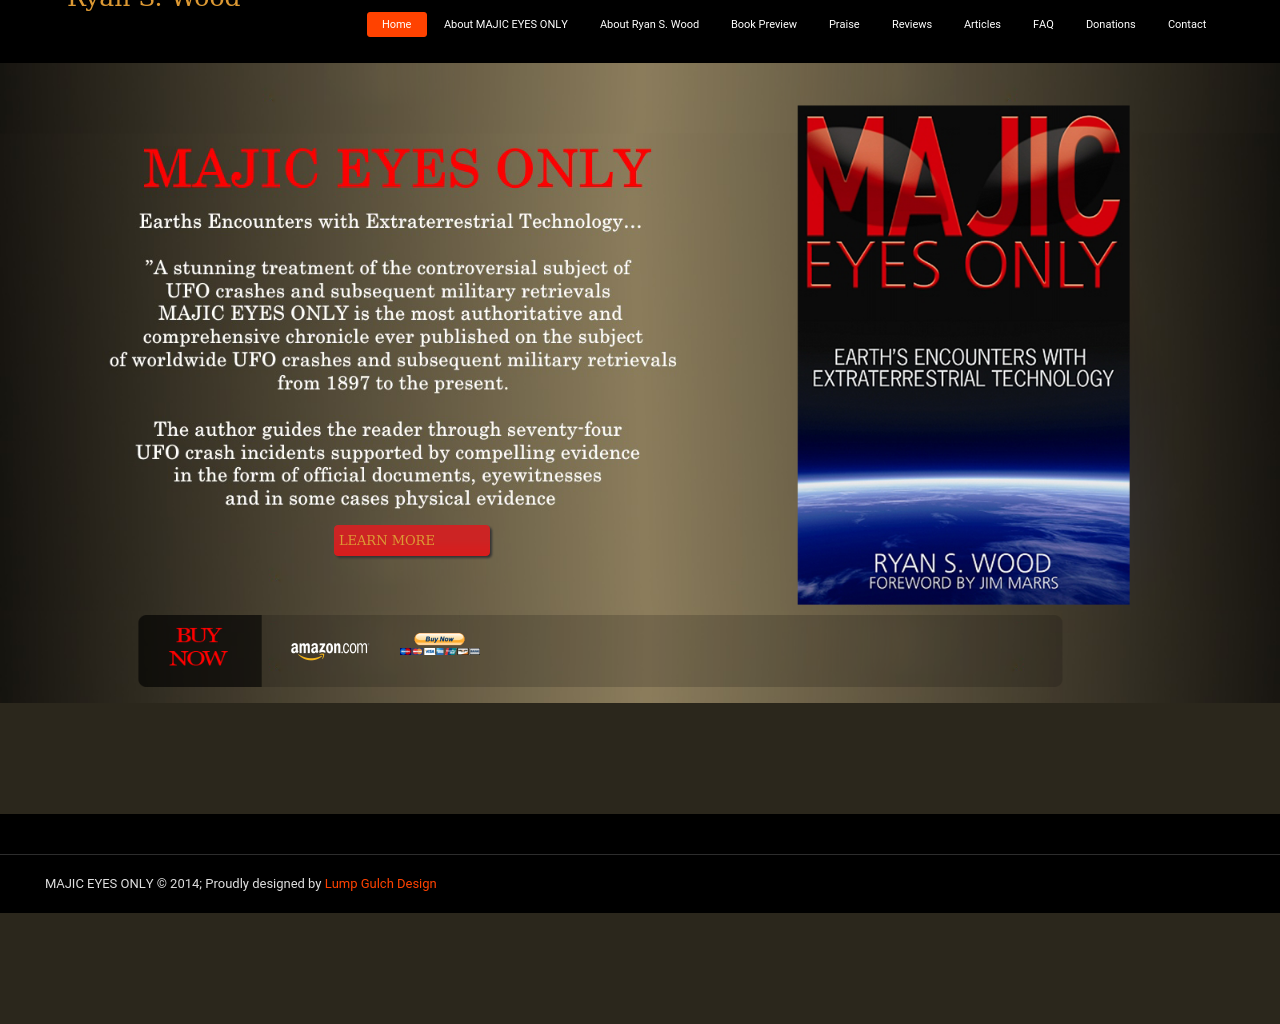 MAJIC-EYES-ONLY-Advertising-Reviews-Pricing